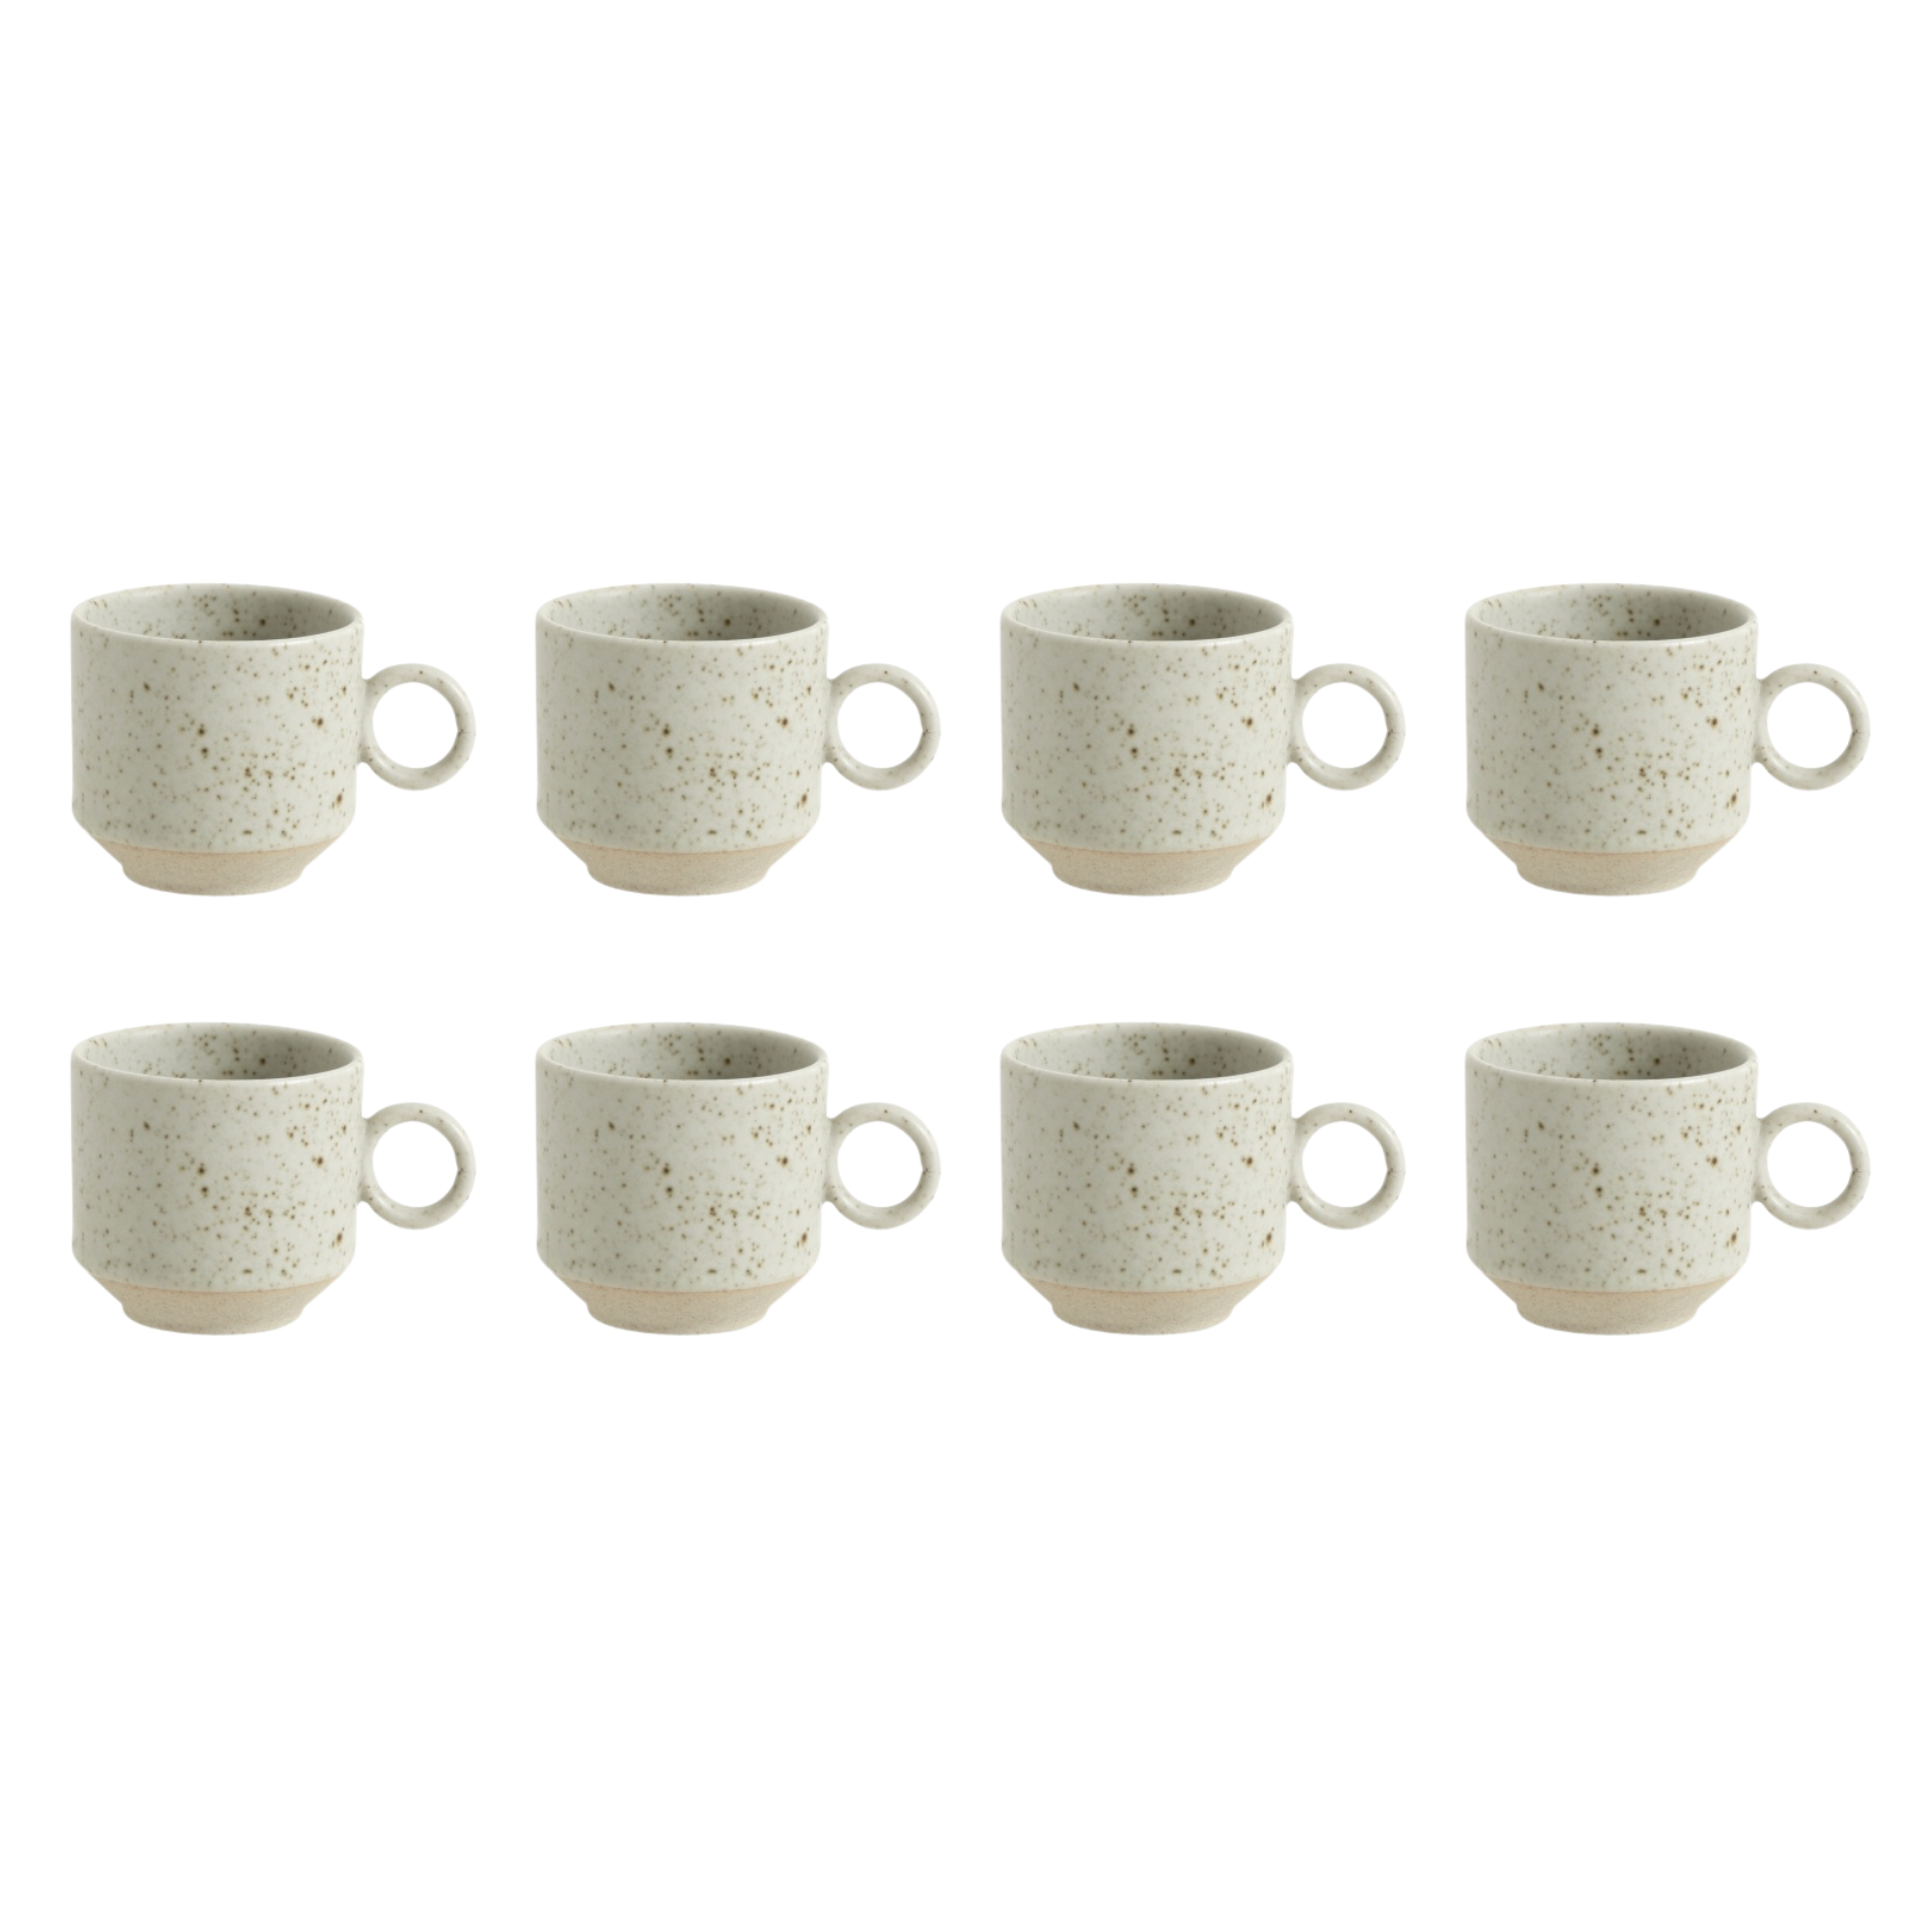 Nordal Grainy espressokopje - zandkleur - set van 8-57022-5708309161518